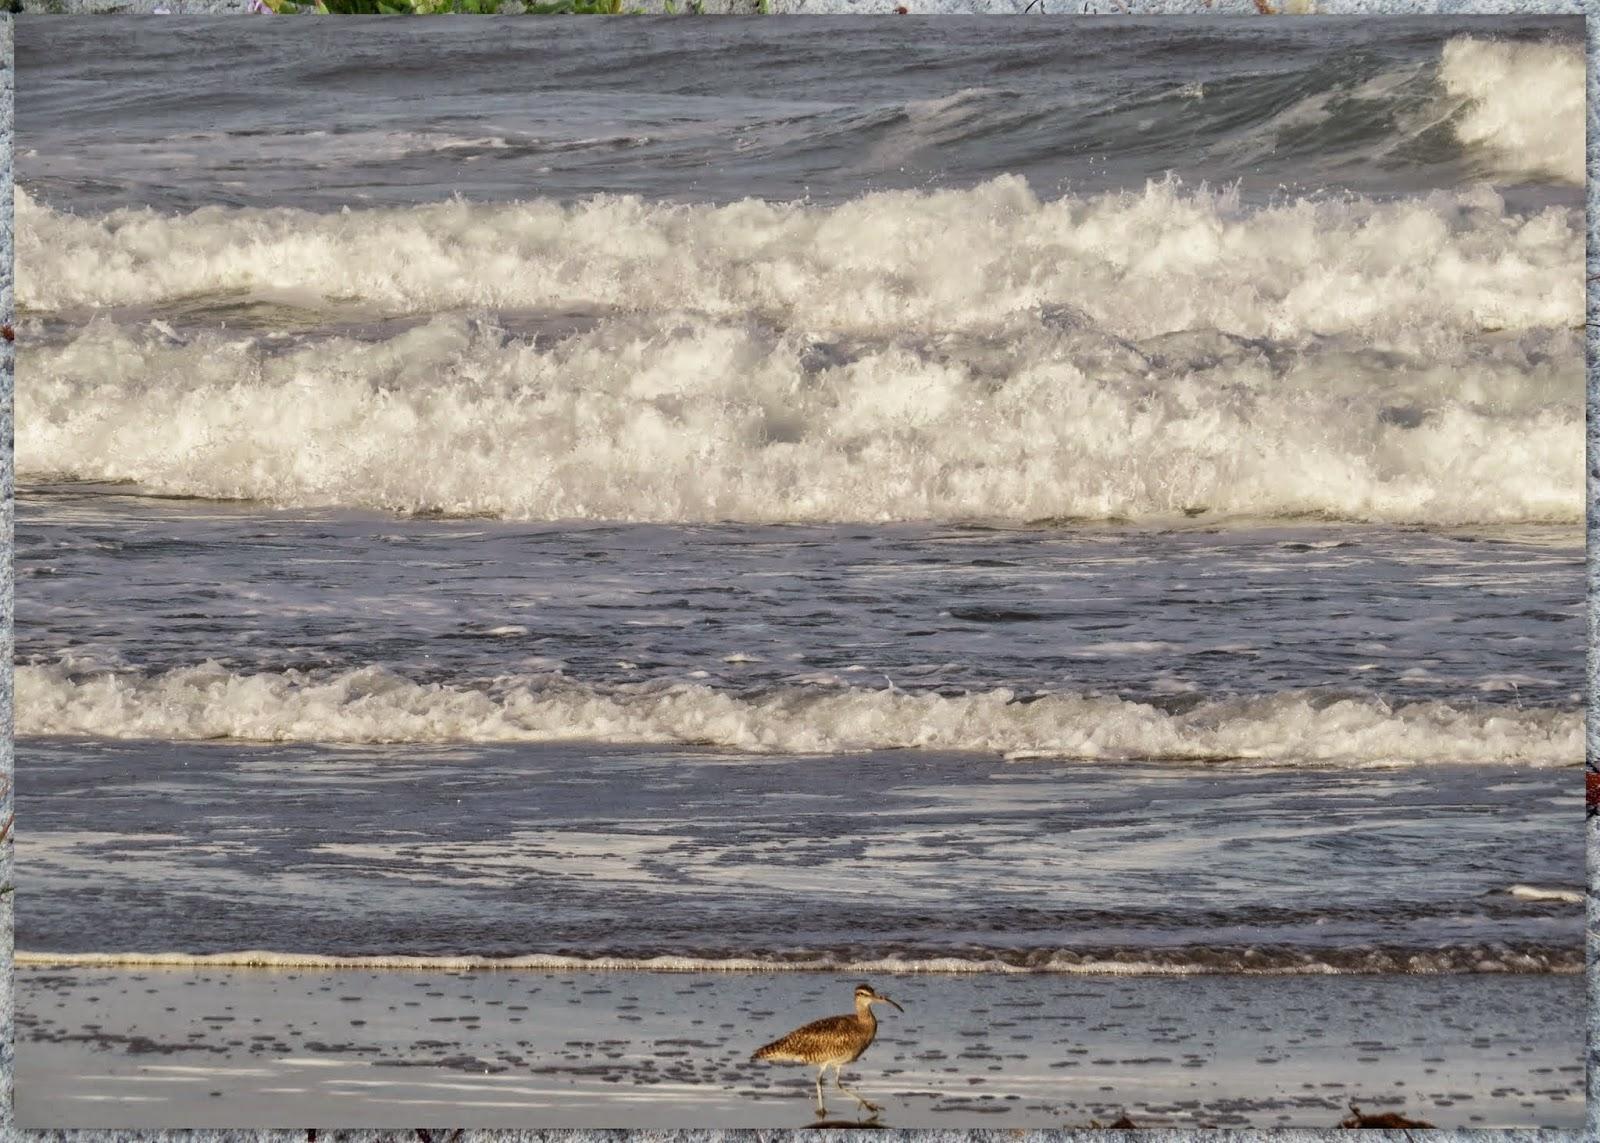 Birds and Crashing Surf